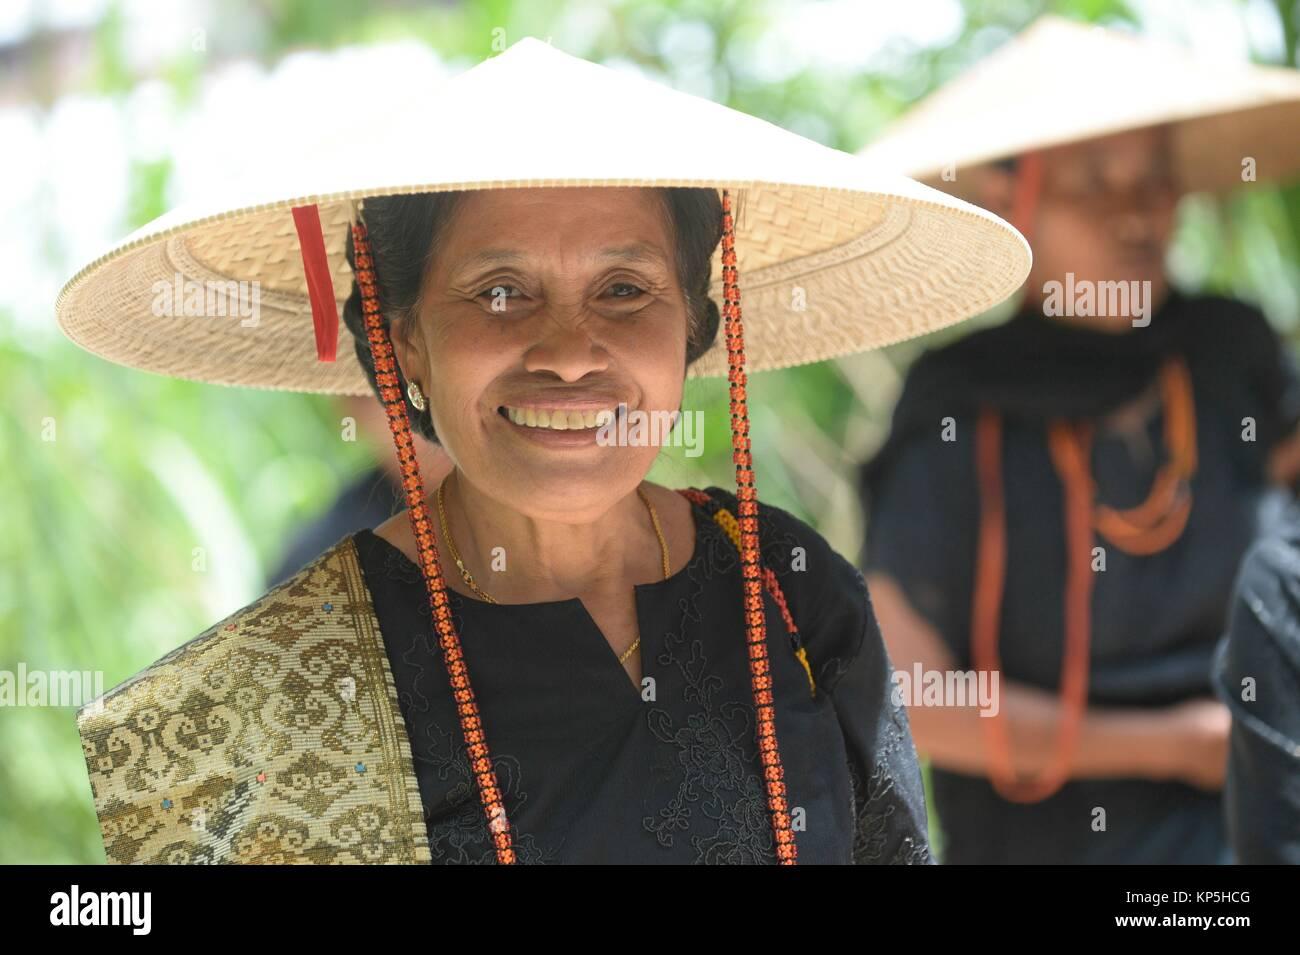 Toraja woman,funeral ceremony,Tana Toraja,Sulawesi,Indonesia. - Stock Image